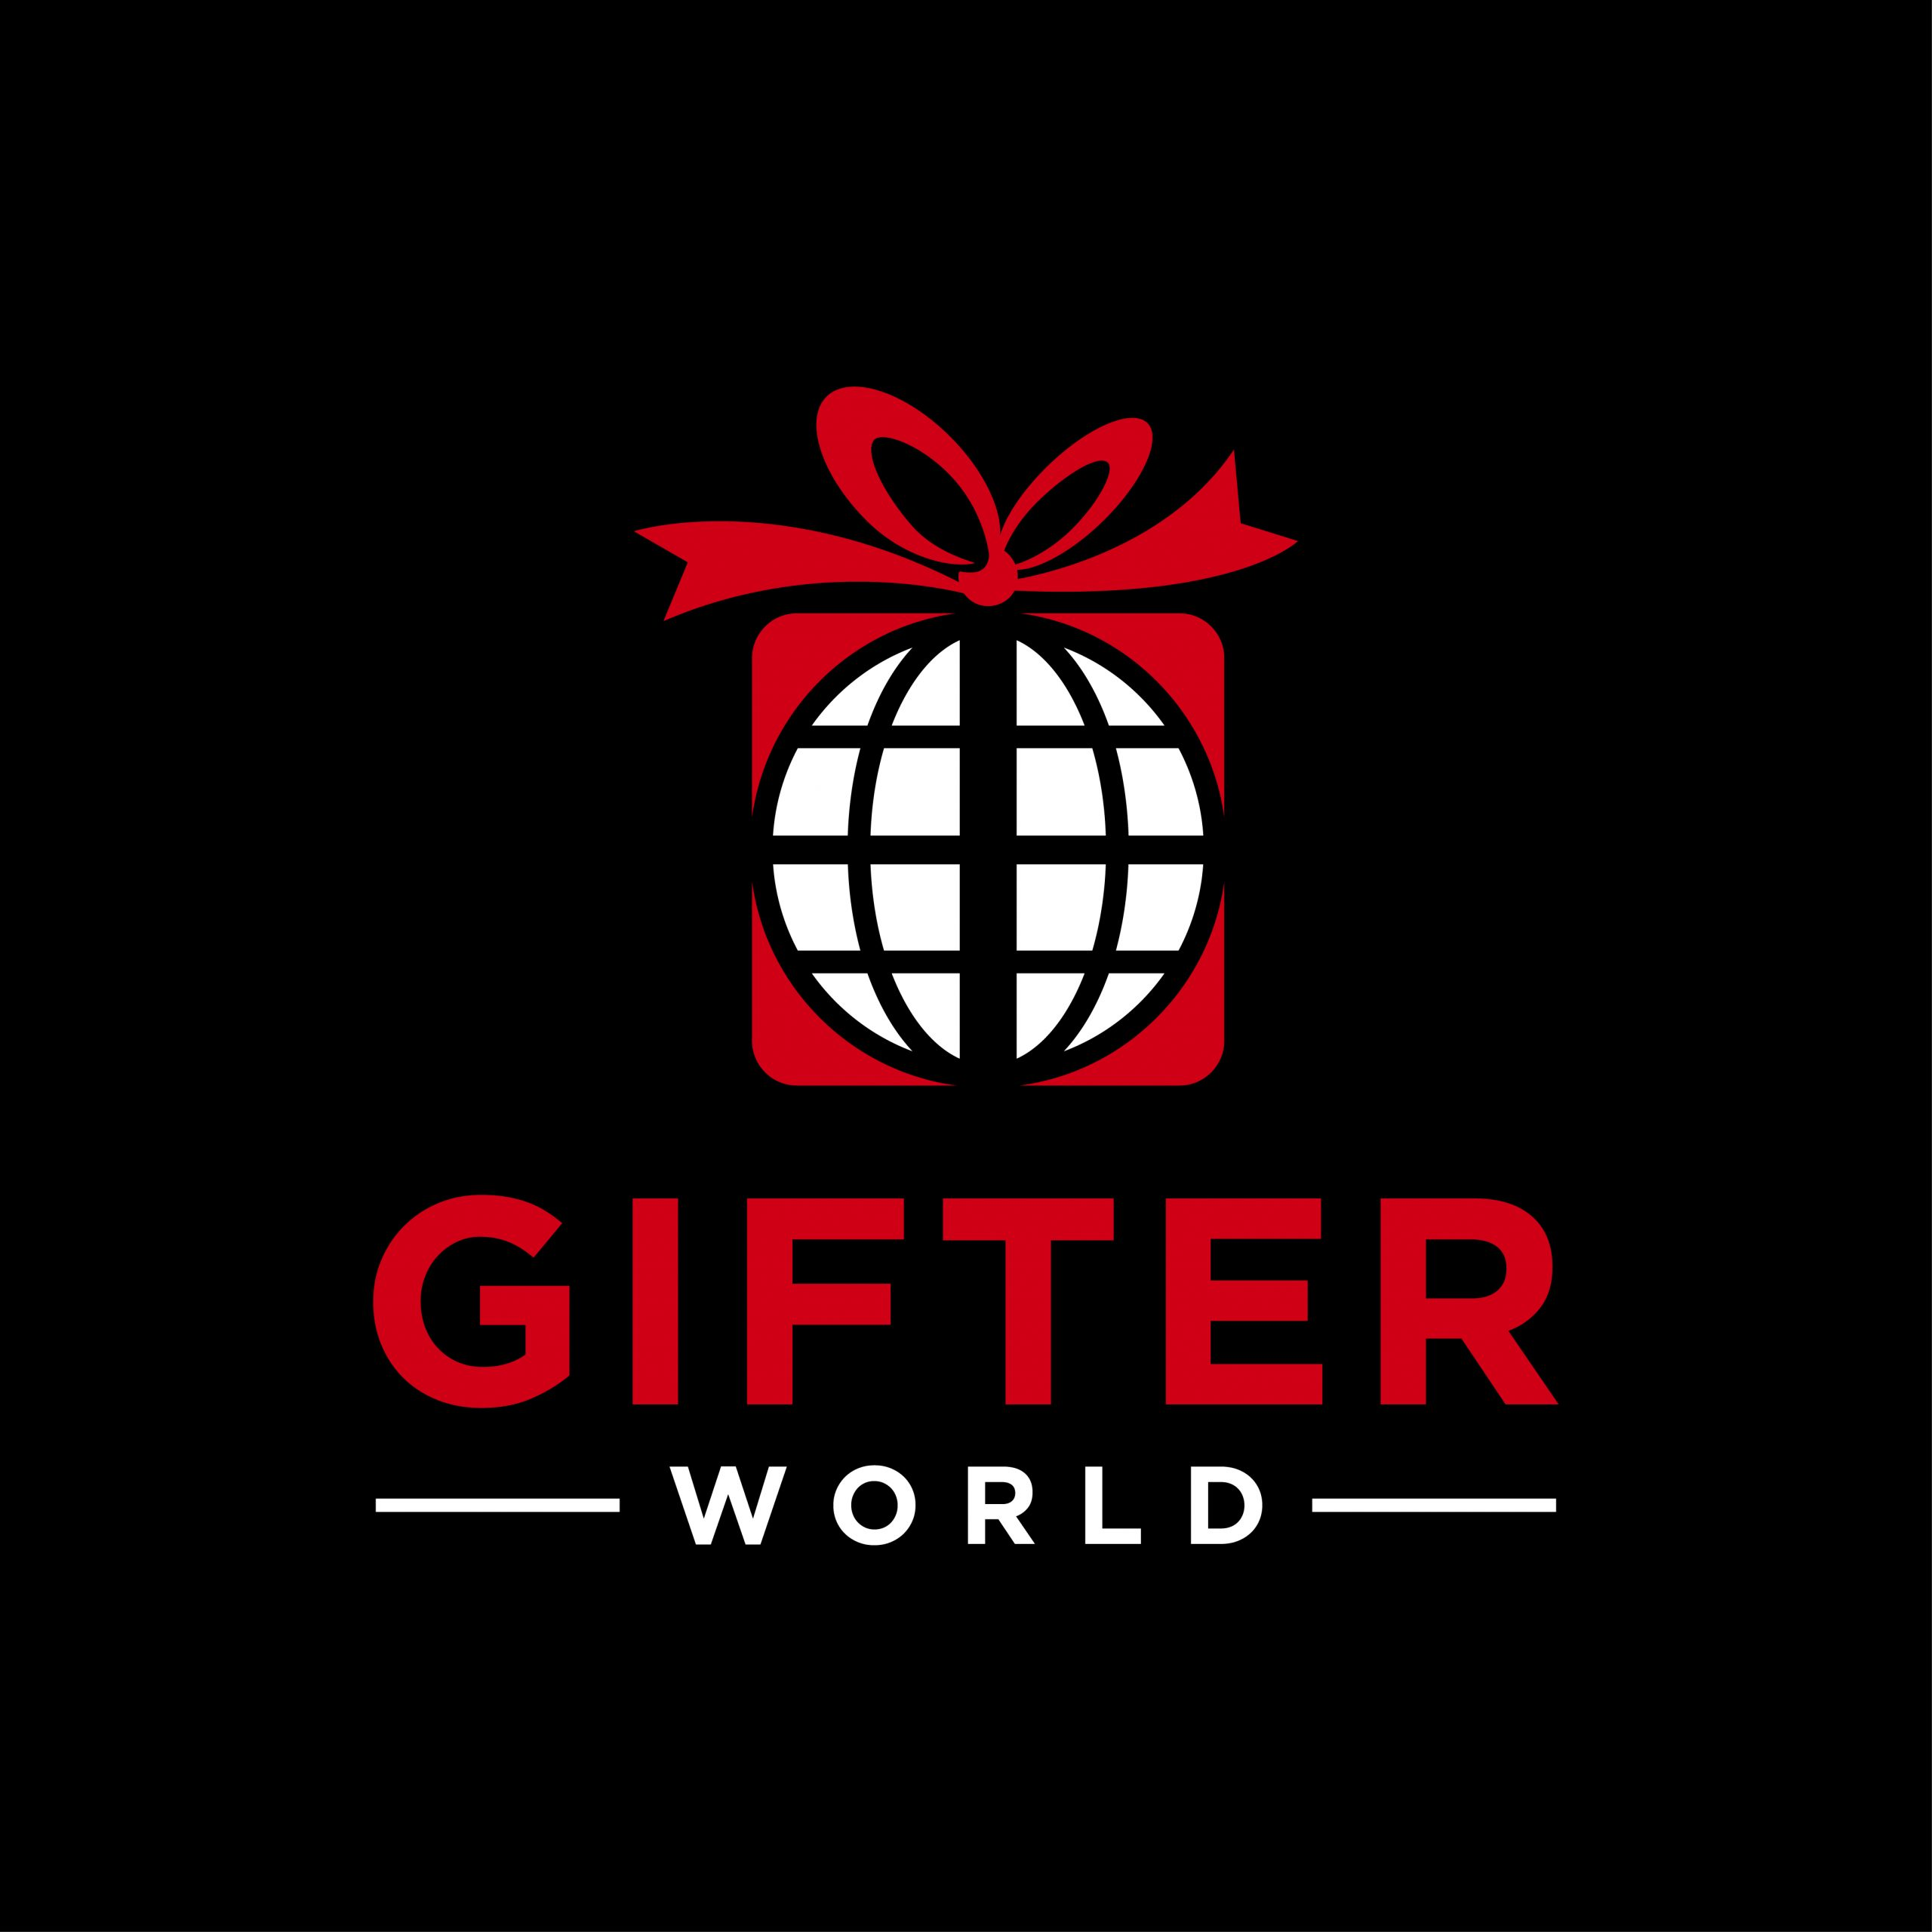 Gifter World